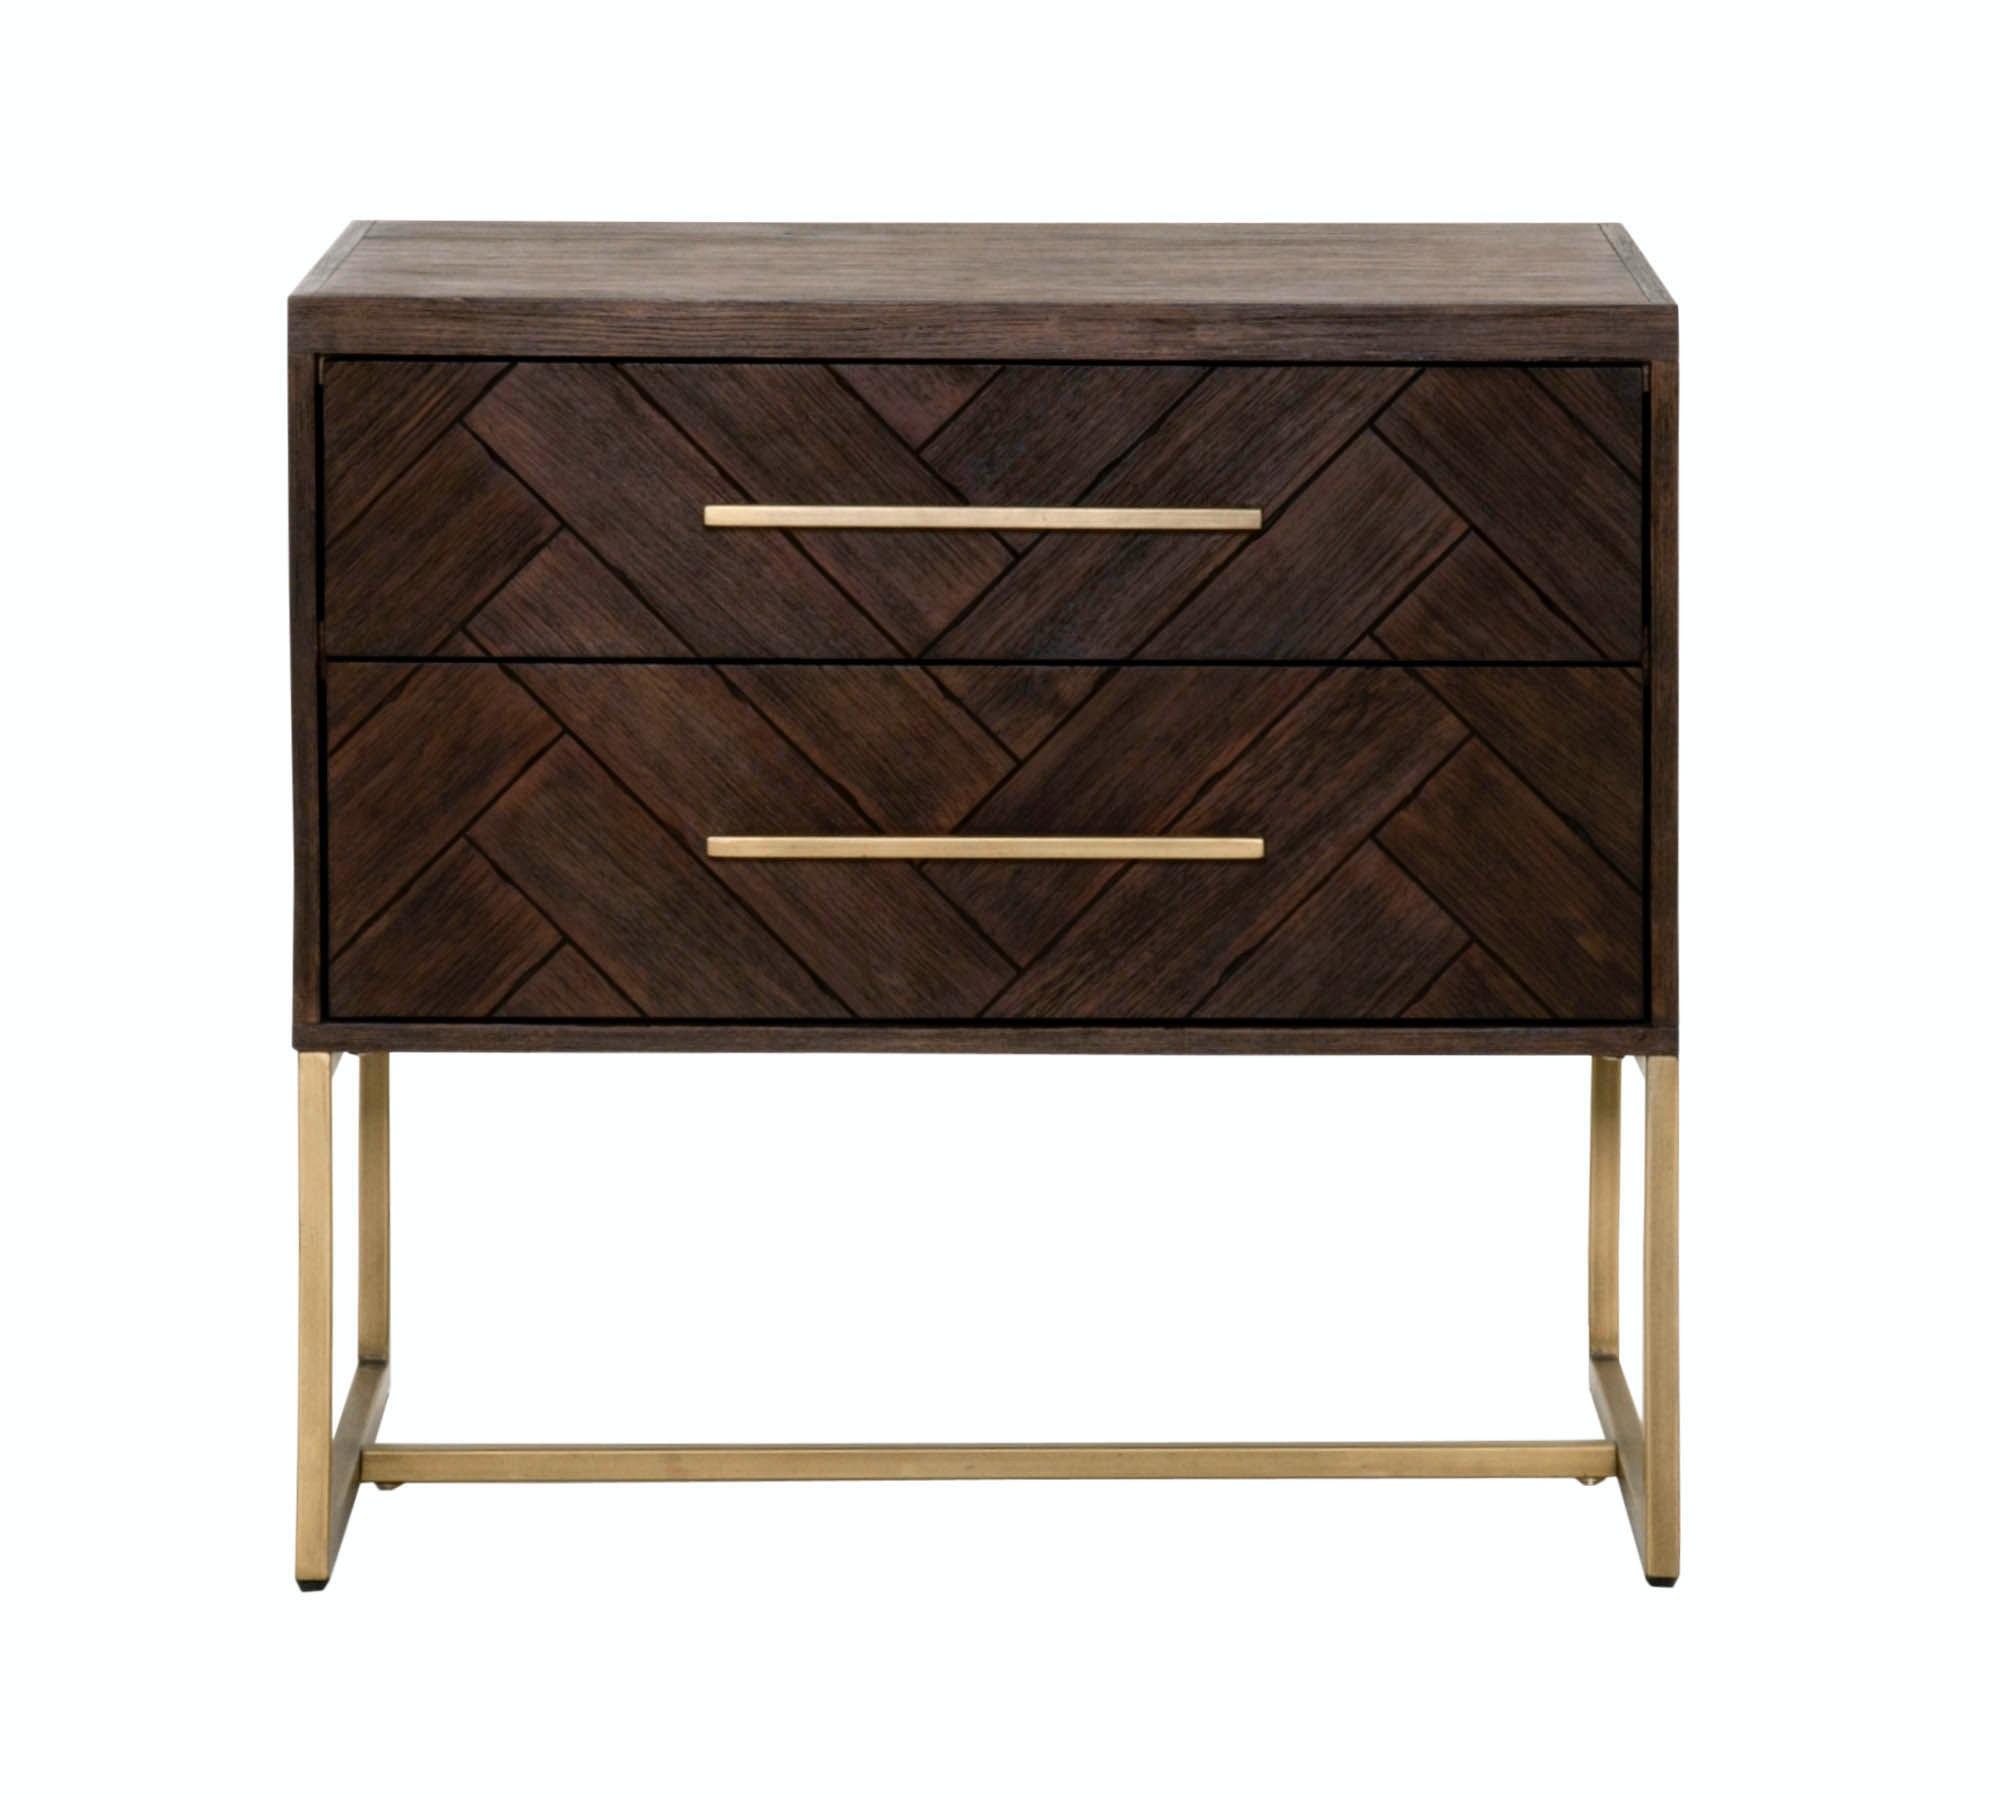 Night Stand Designs : Orient express furniture bedroom mosaic nightstand rjav